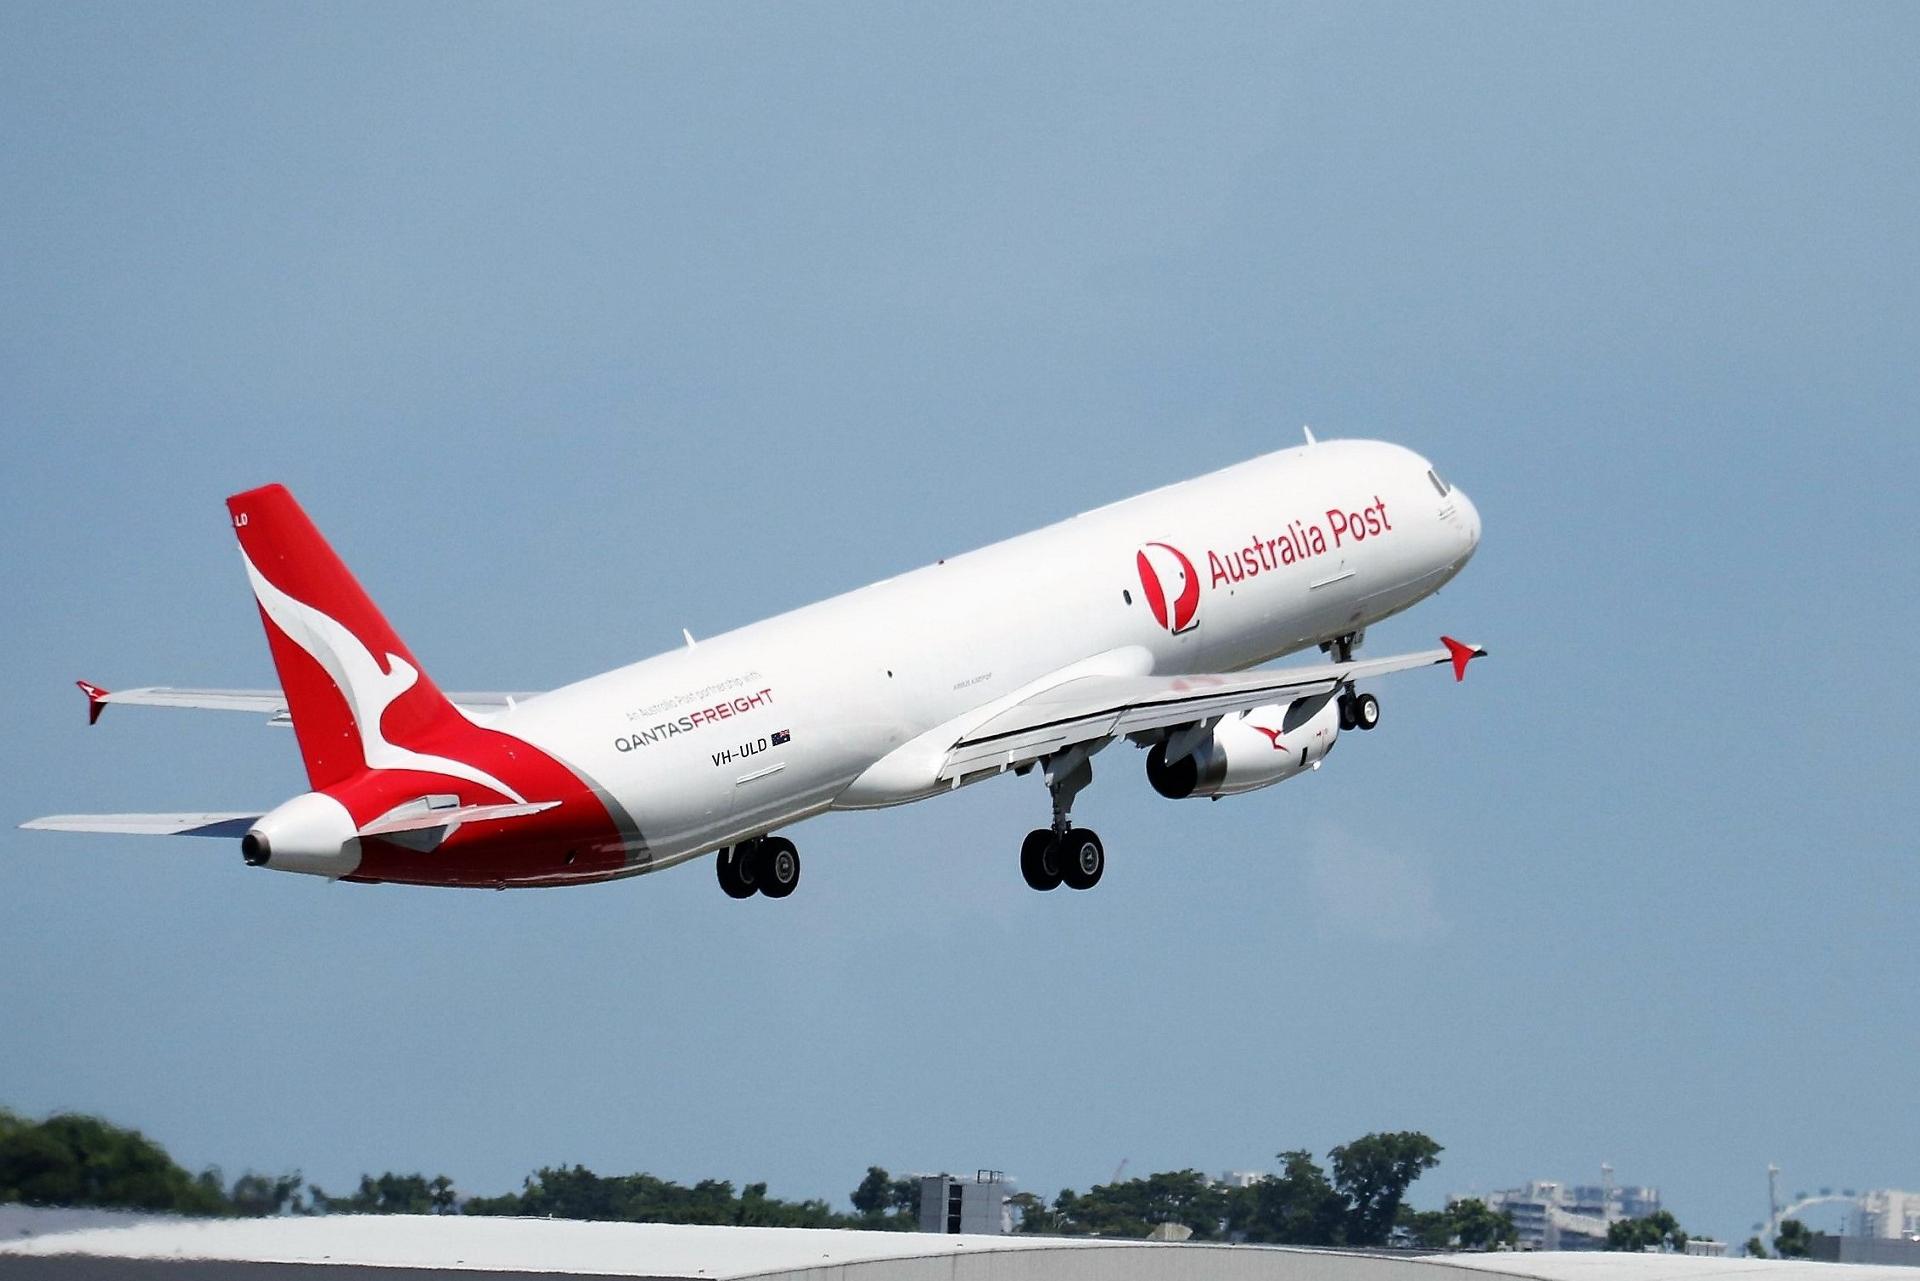 Qantas A321 P2f Enters Into Service V3